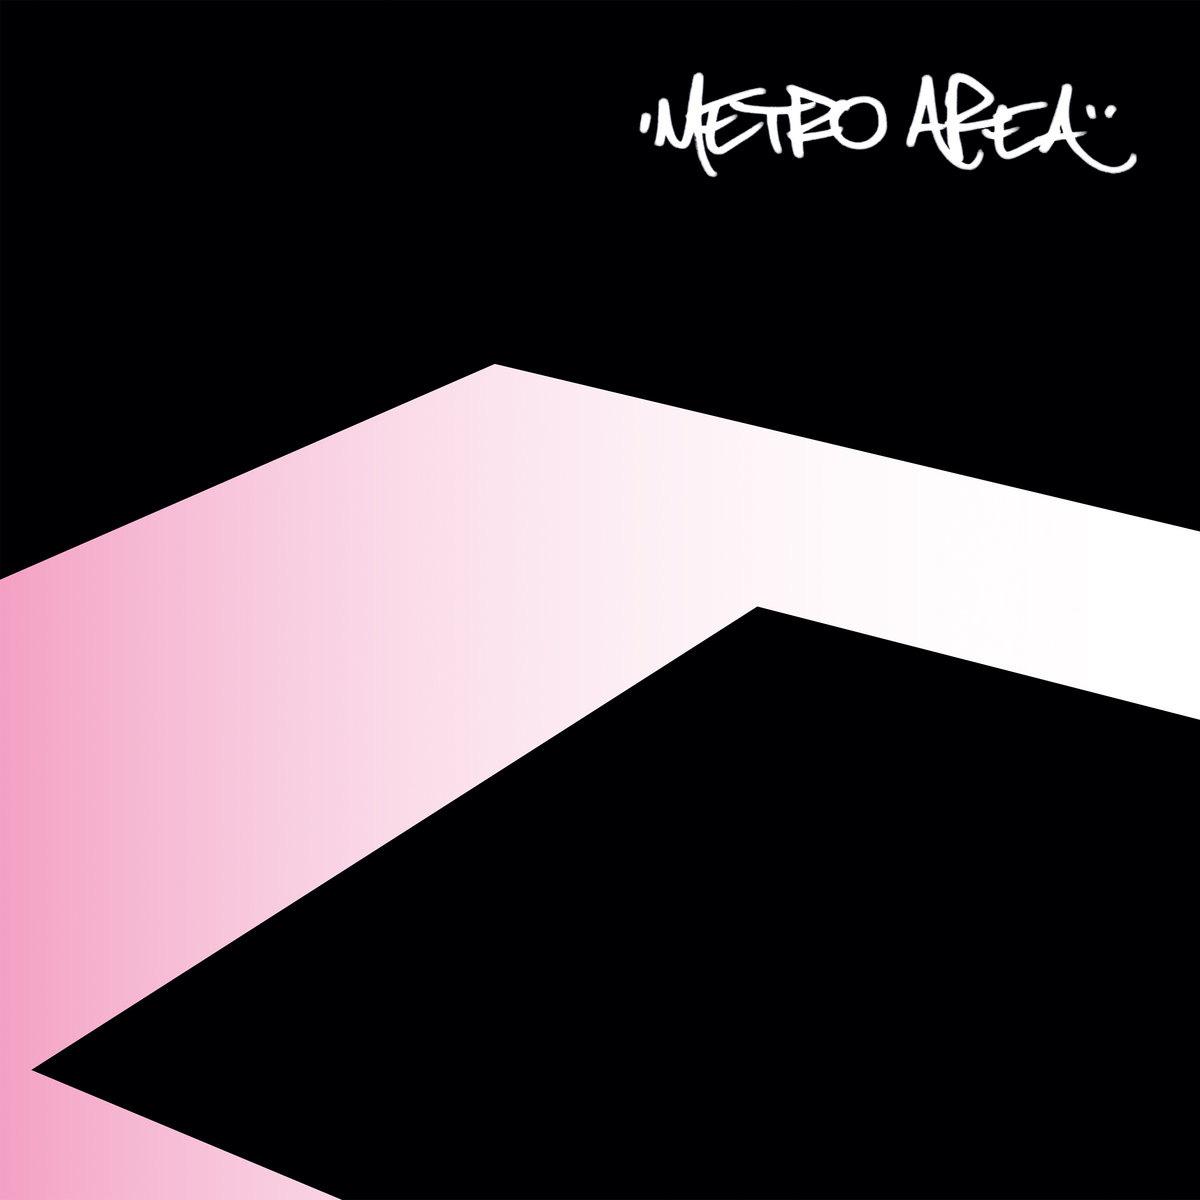 Metro Area (15th Anniversary Edition) | Metro Area